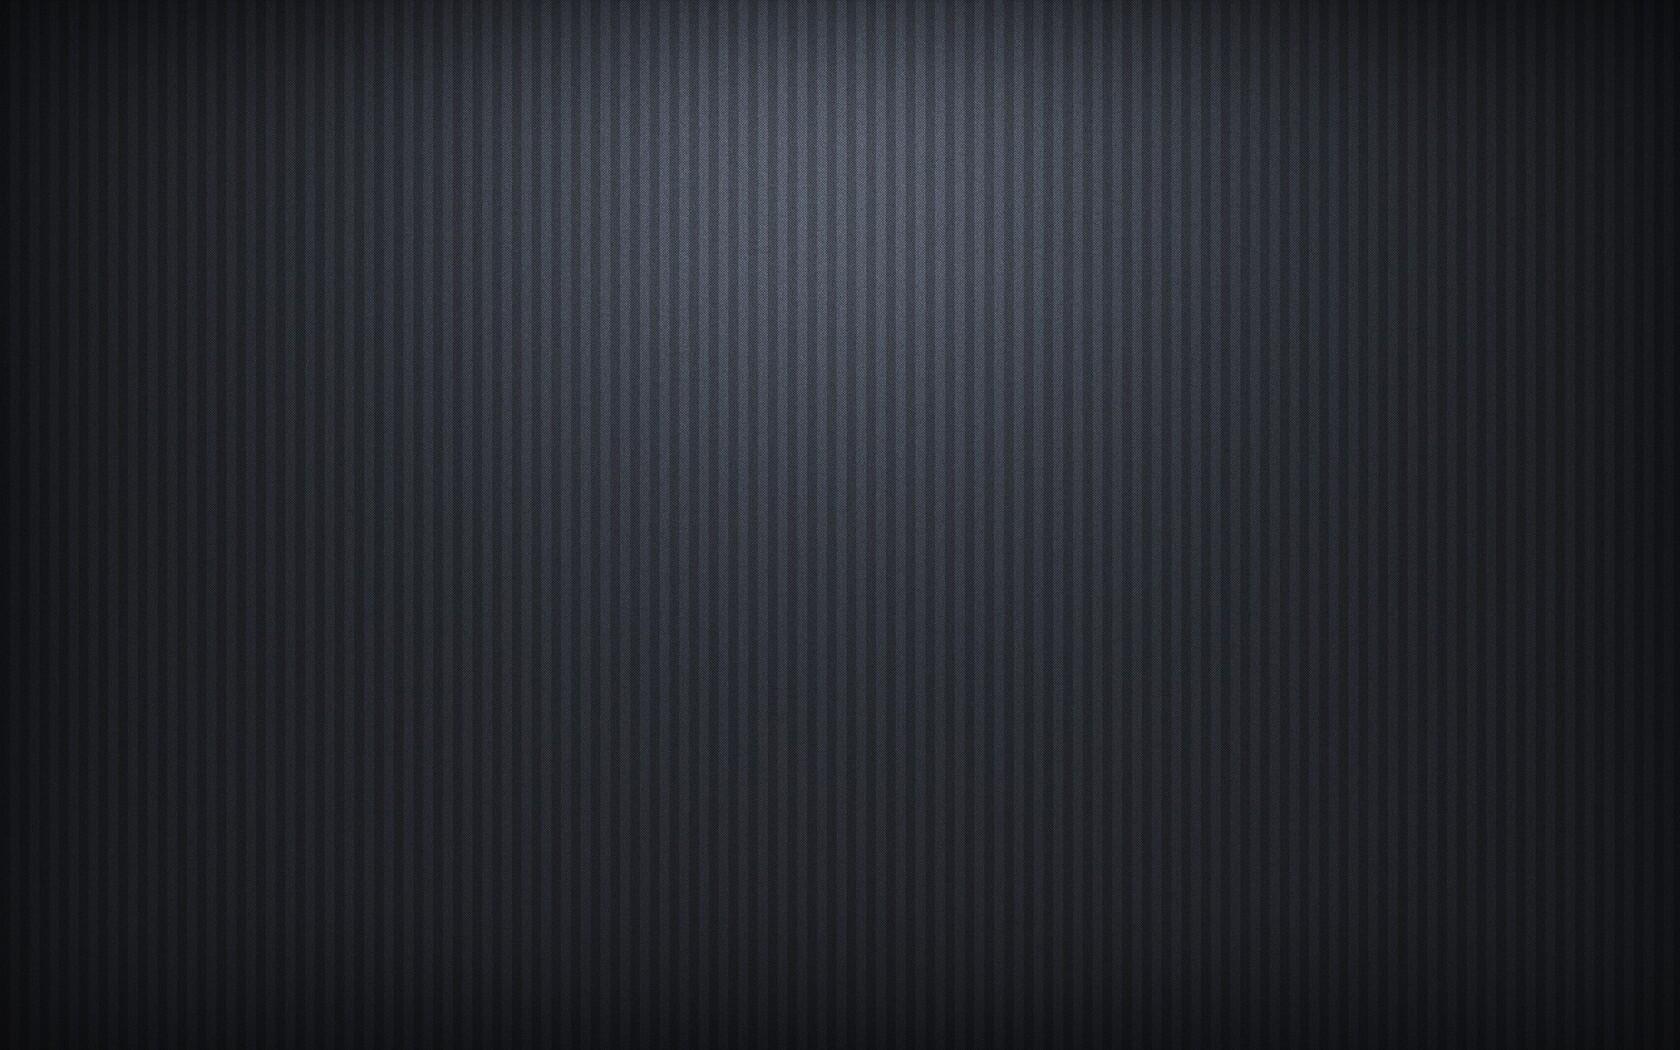 1680x1050 texture abstract minimalism 1680x1050 resolution hd 4k